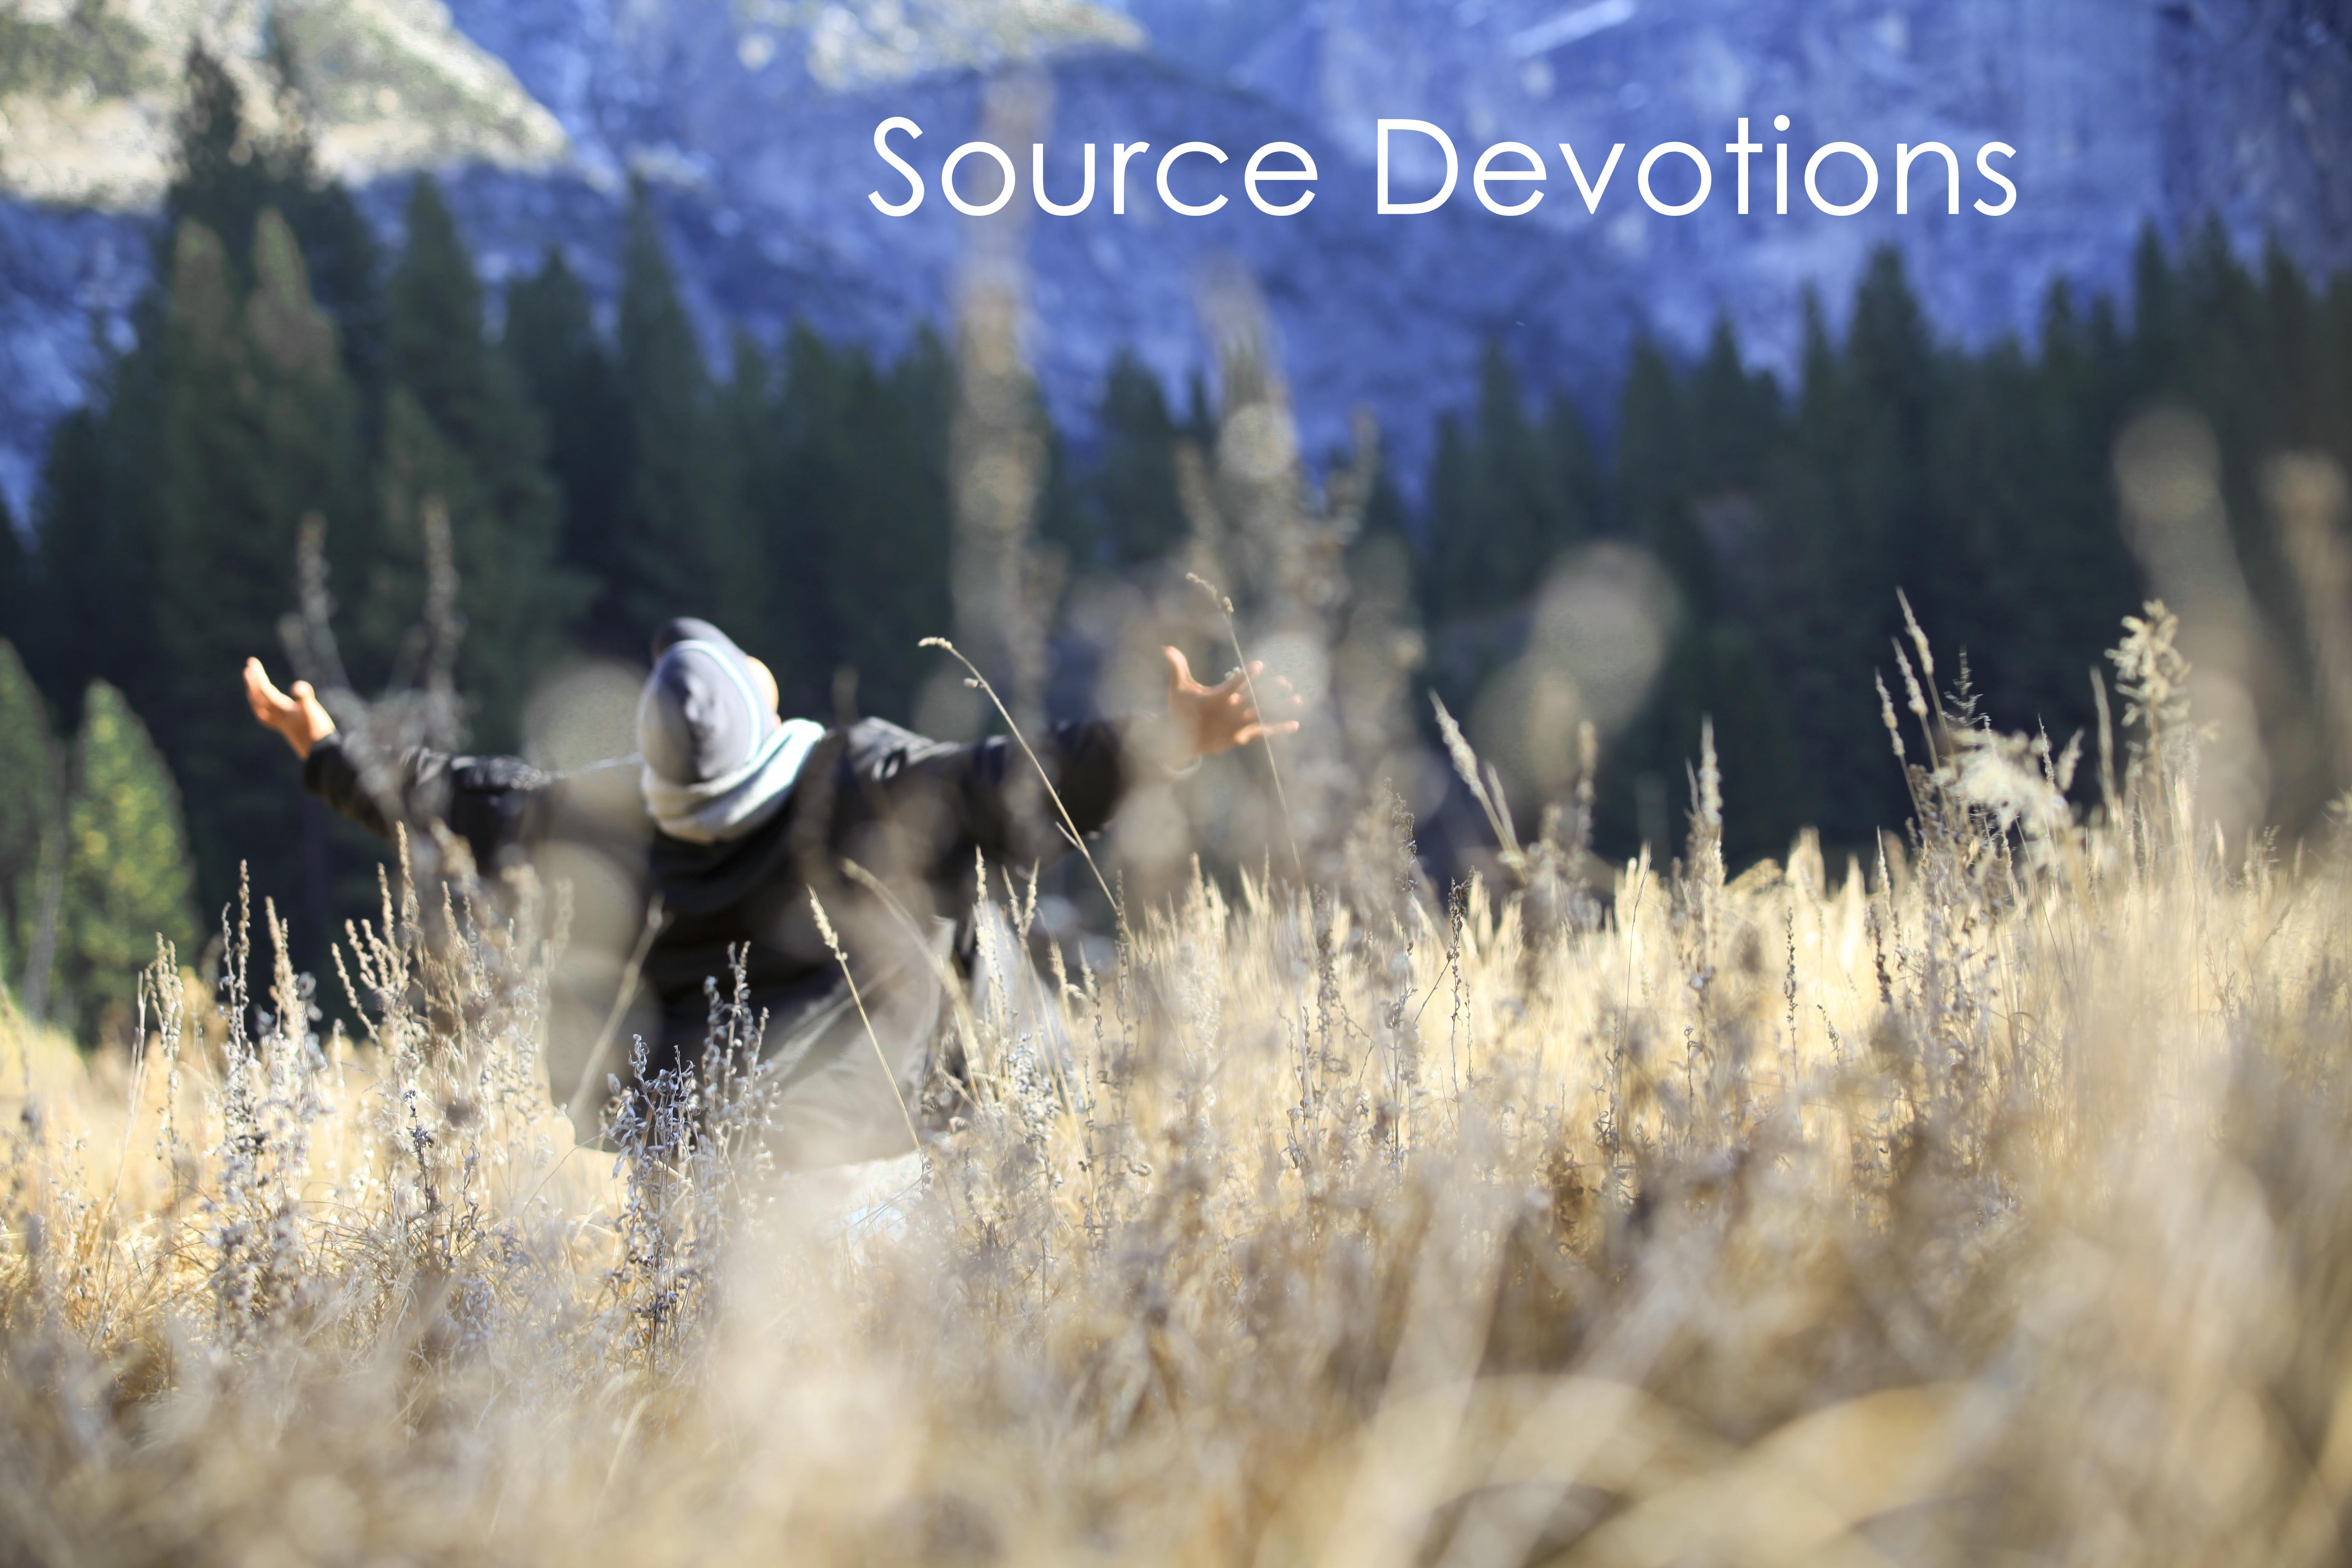 Devotion: Measuring Up